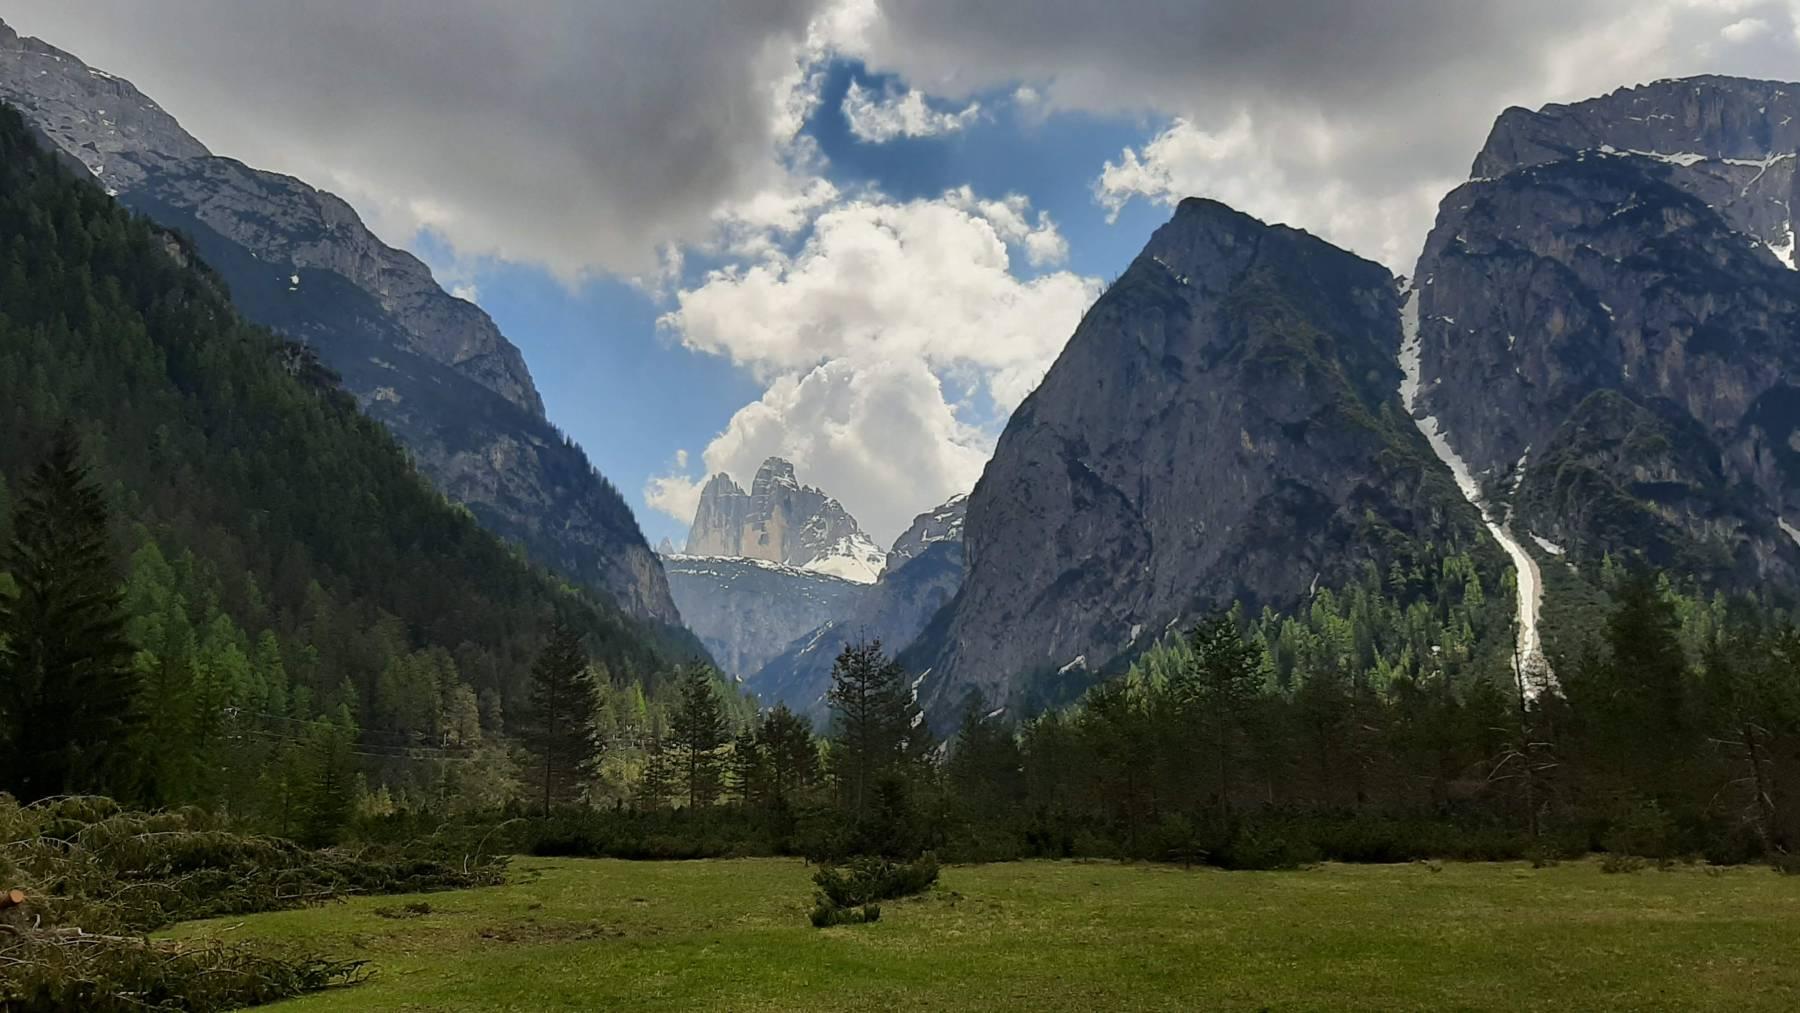 Pohled na Tre Cime di Lavaredo